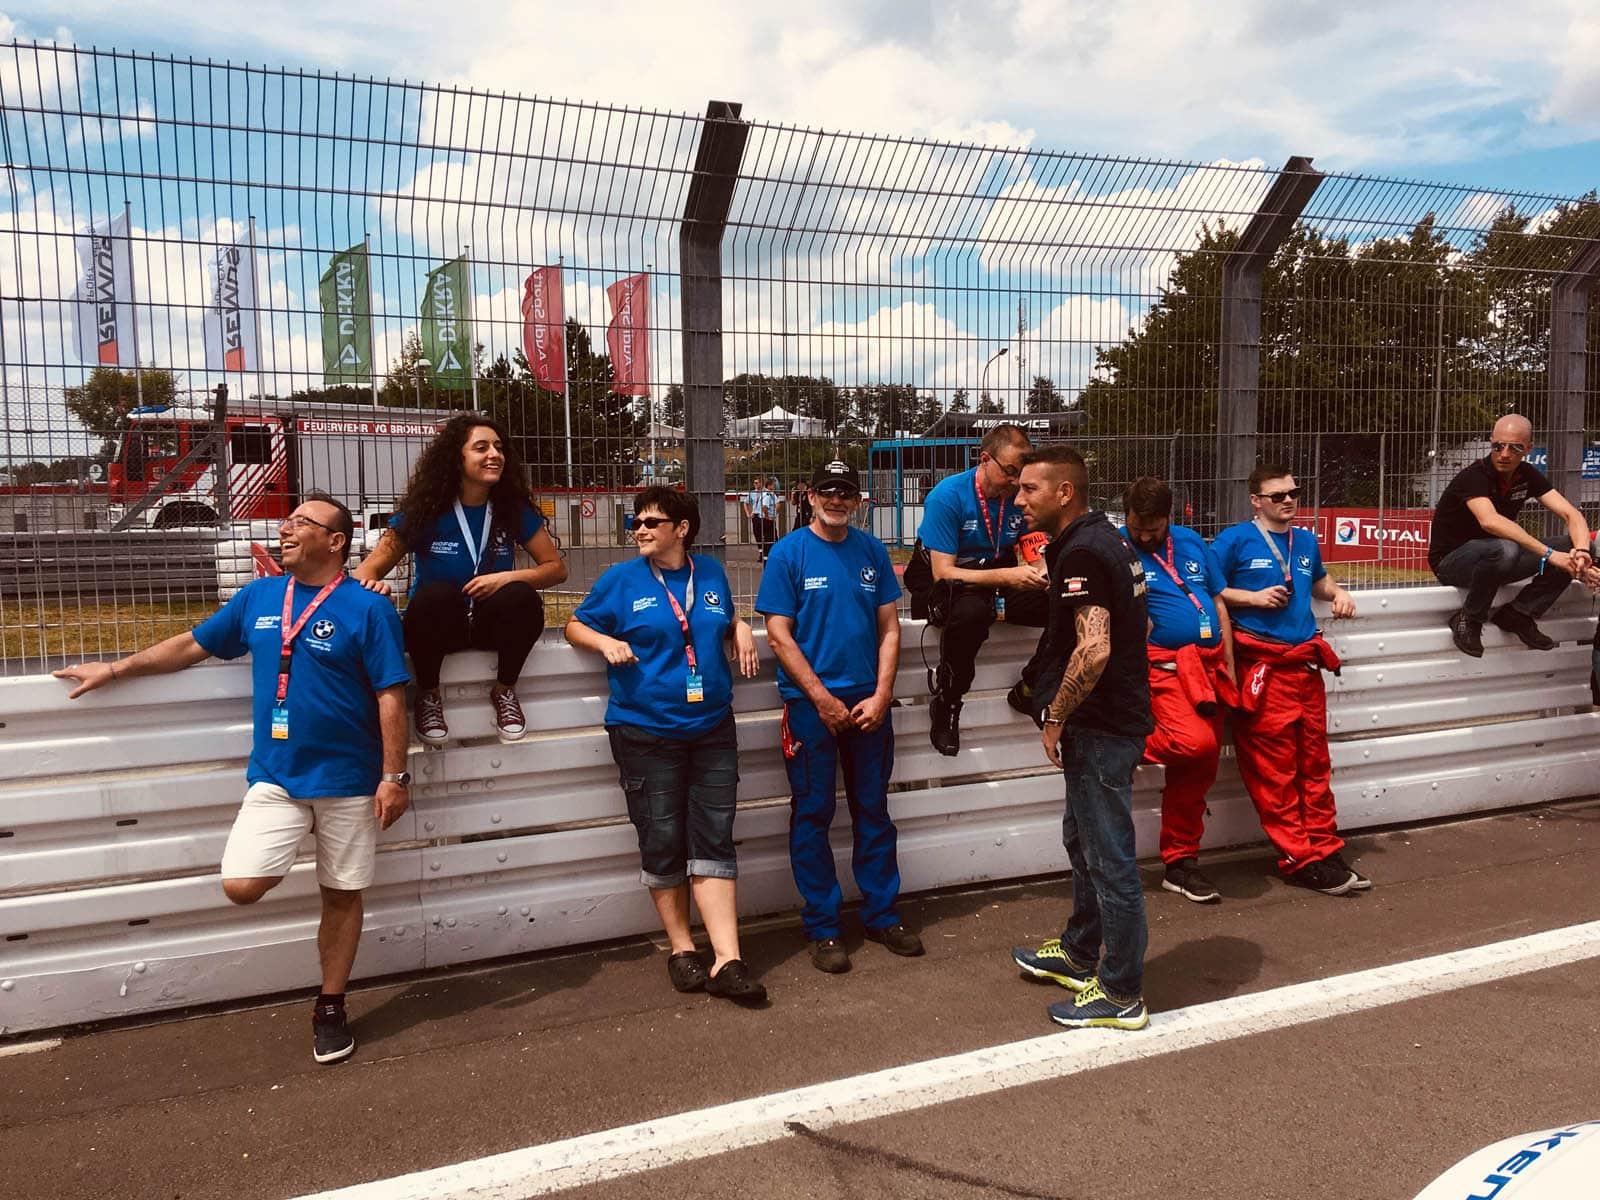 IMG E2021 - 21.-23. Juni 2019 – ADAC TOTAL 24h Rennen – Nürburgring / DE